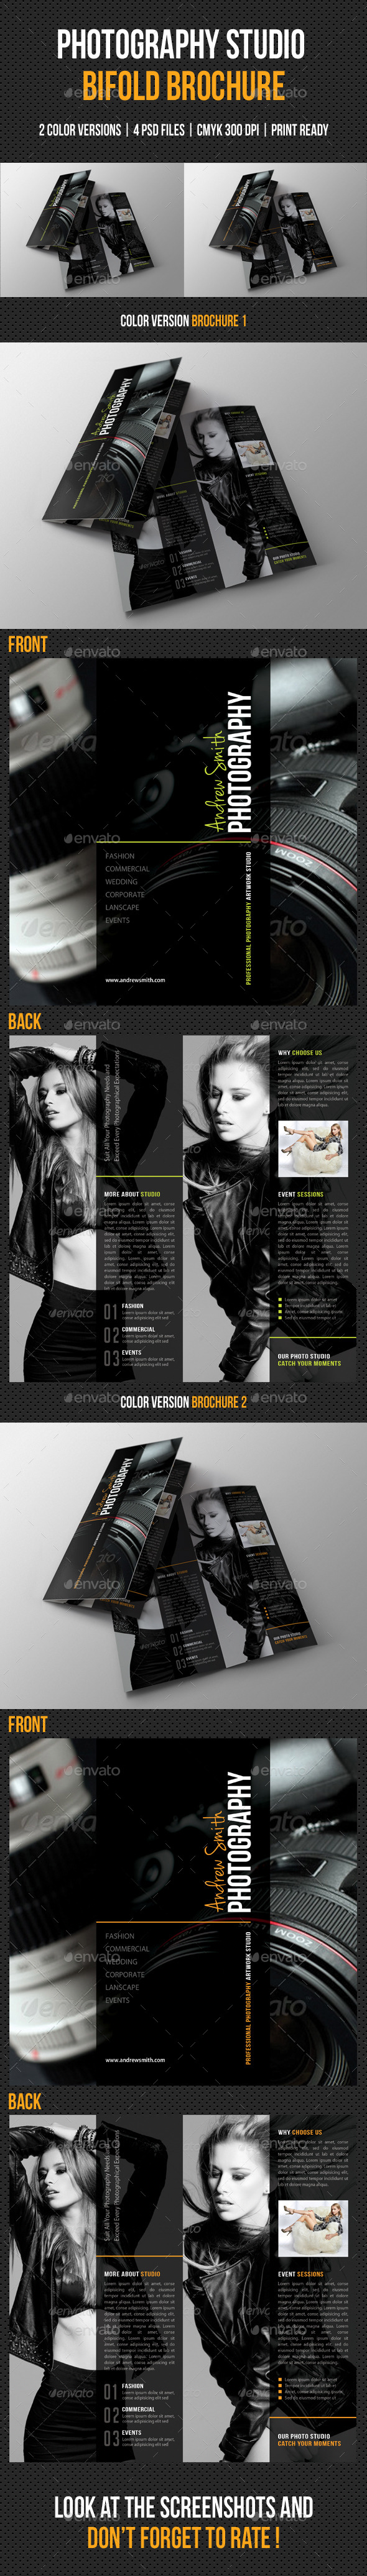 Photography Studio Bifold Brochure 03 - Portfolio Brochures